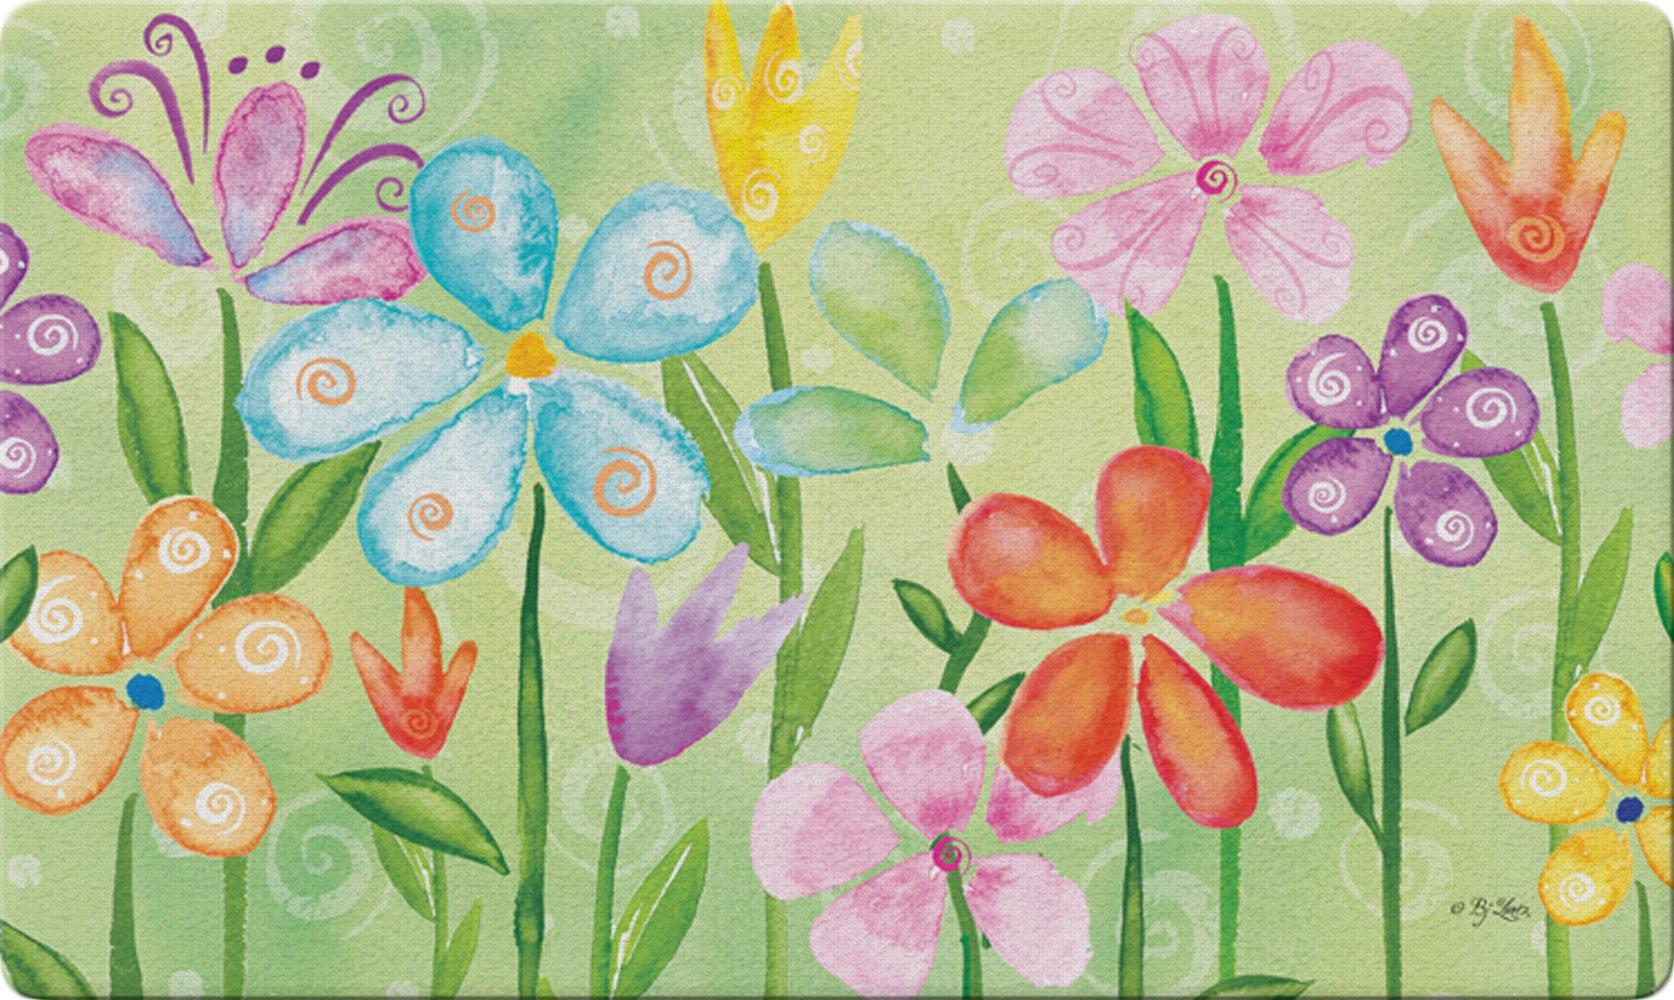 Toland Home Garden Spring Blooms 18 x 30 Inch Decorative Floor Mat Flower Colorful Floral Doormat